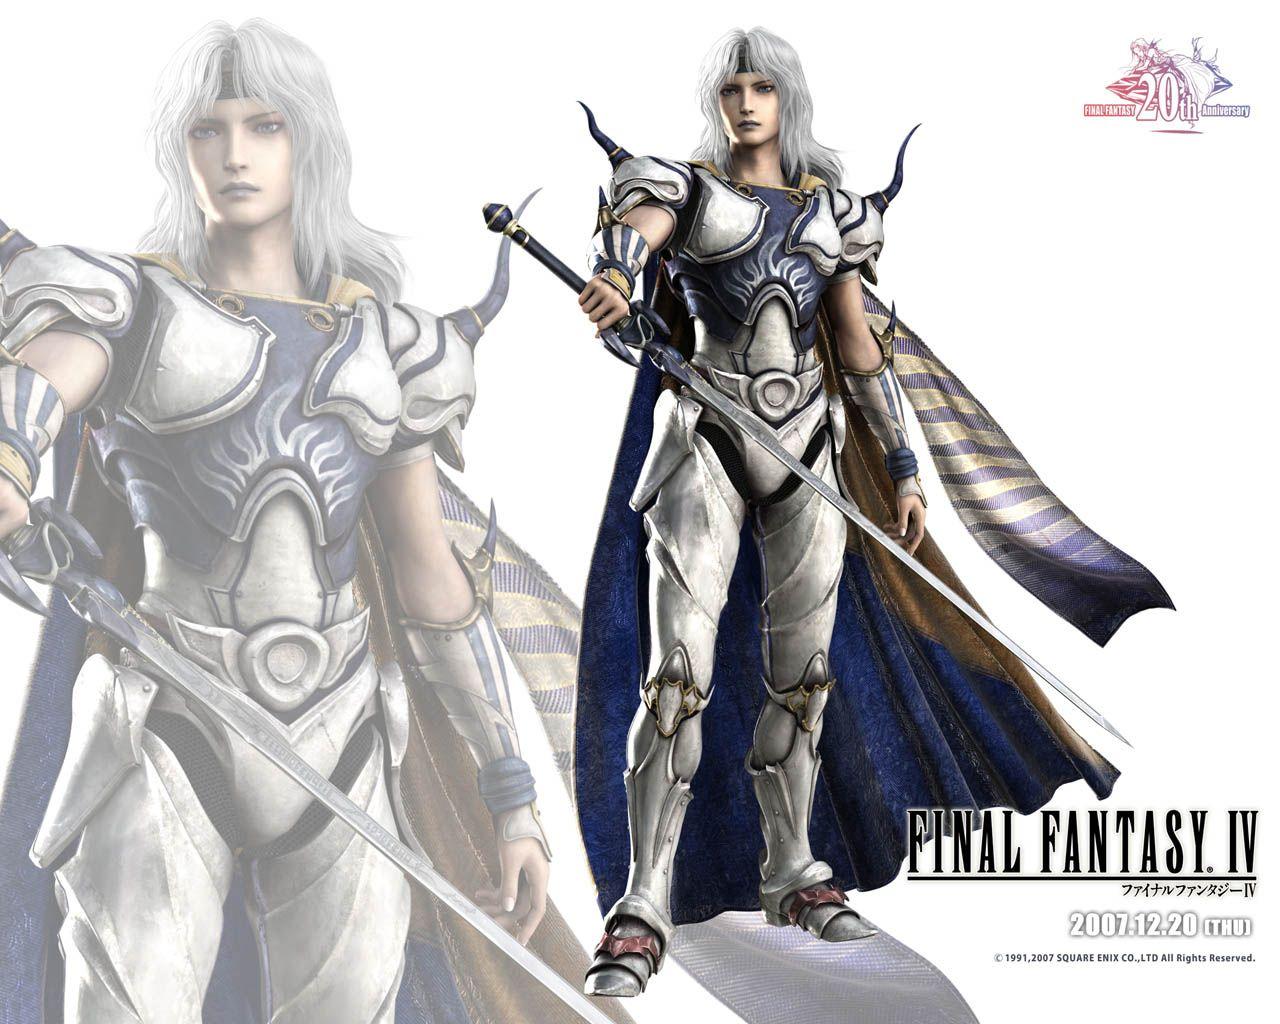 Final Fantasy 4 Wallpaper Hd